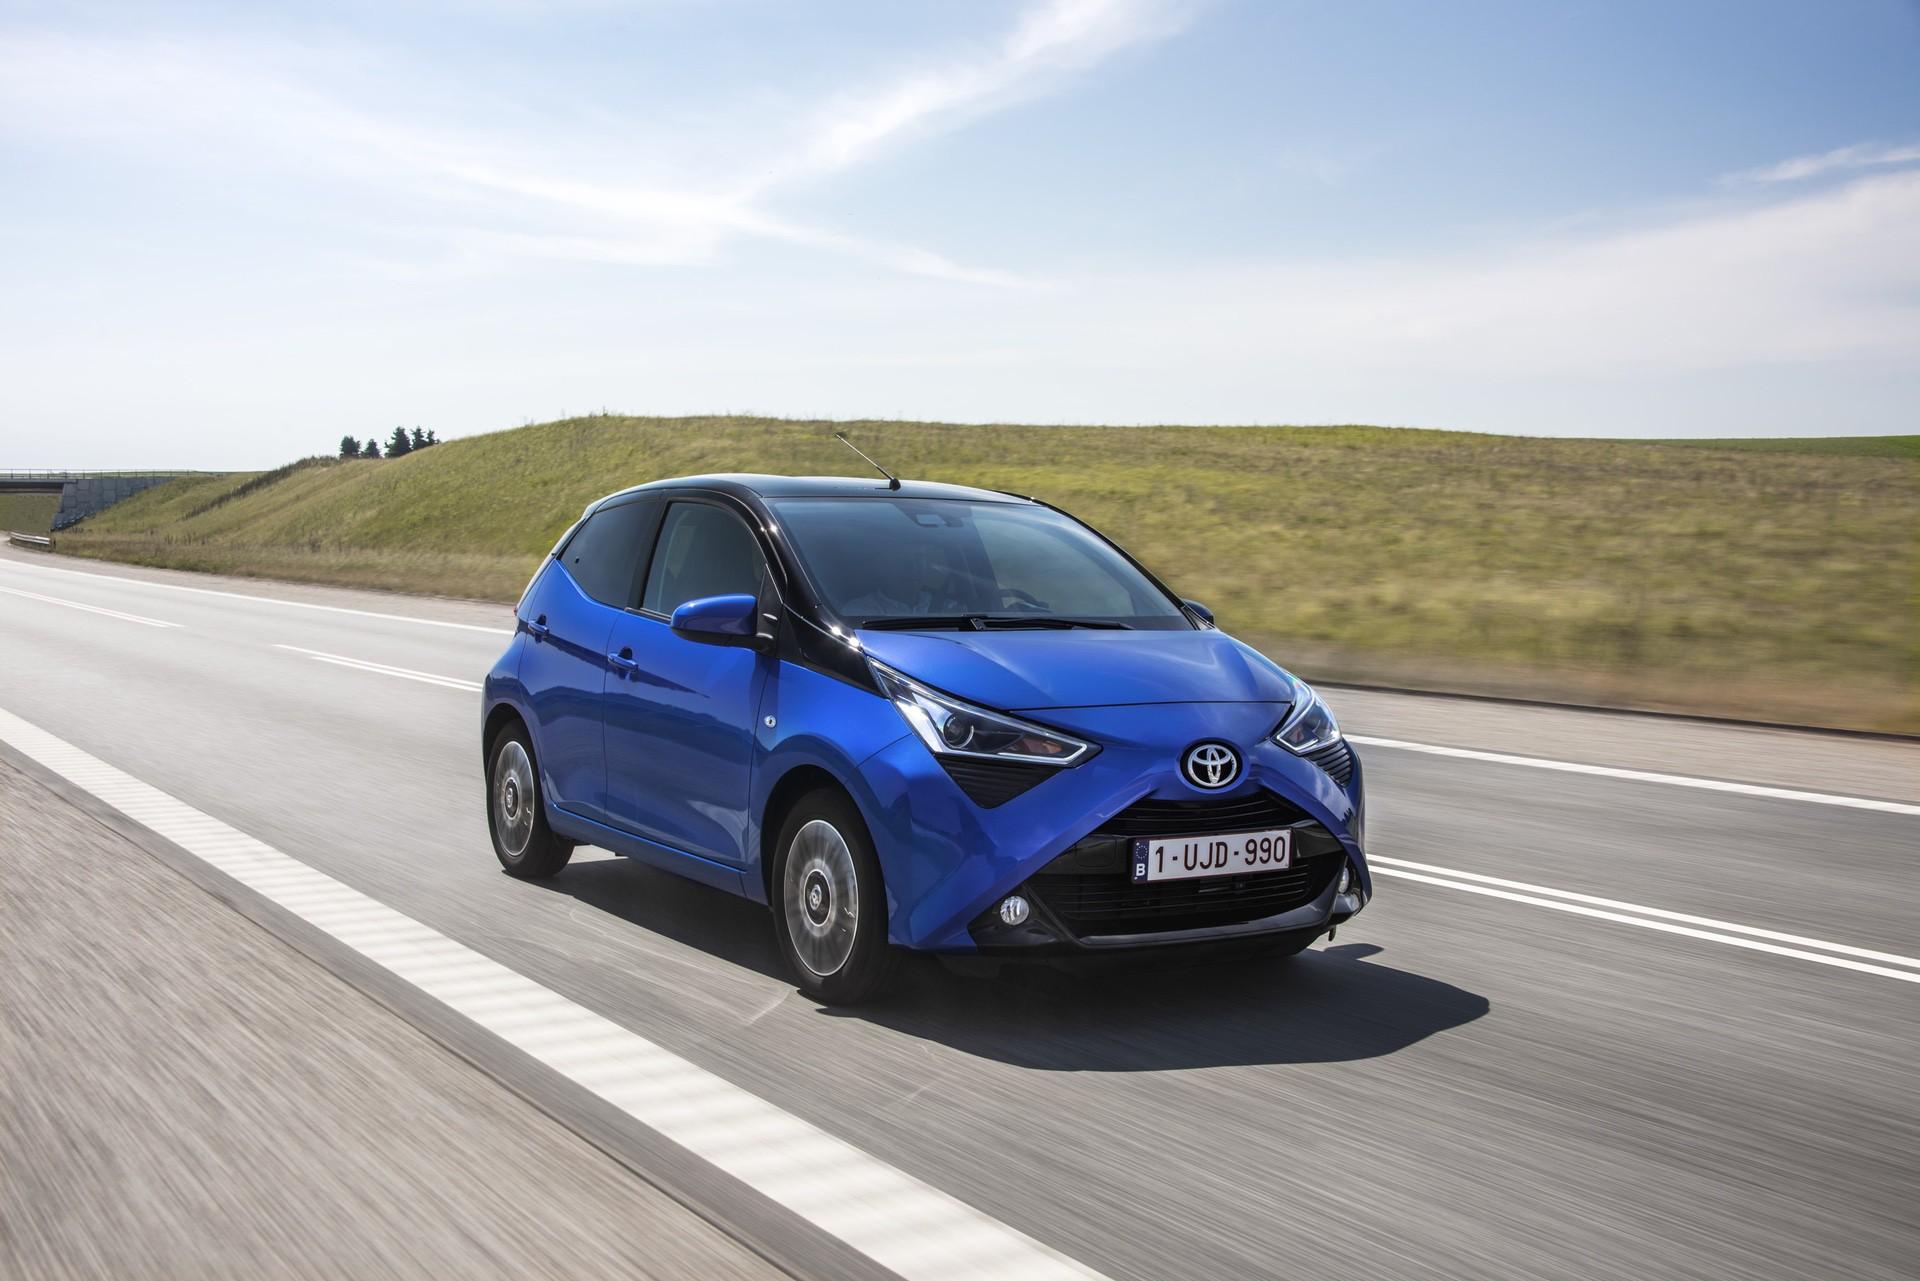 Toyota_Aygo_facelift_presskit_0002